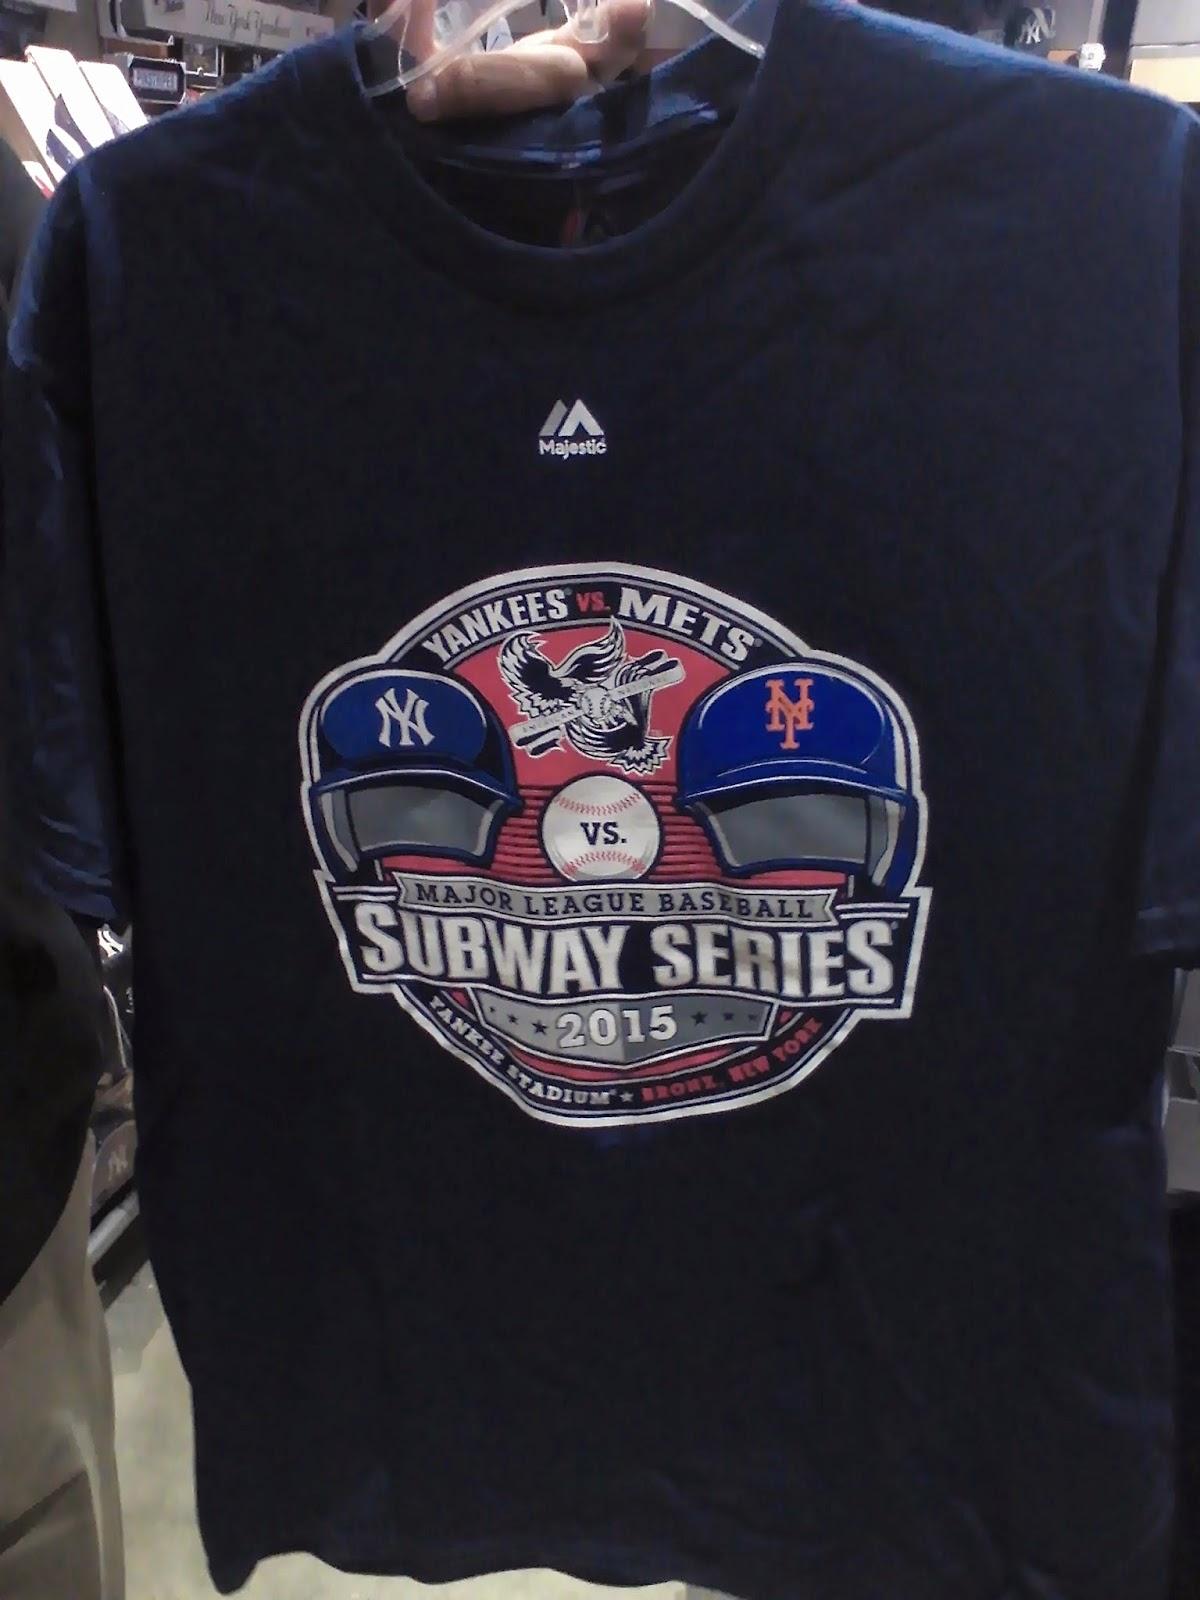 subway squawkers a yankees mets rivalry blog subway